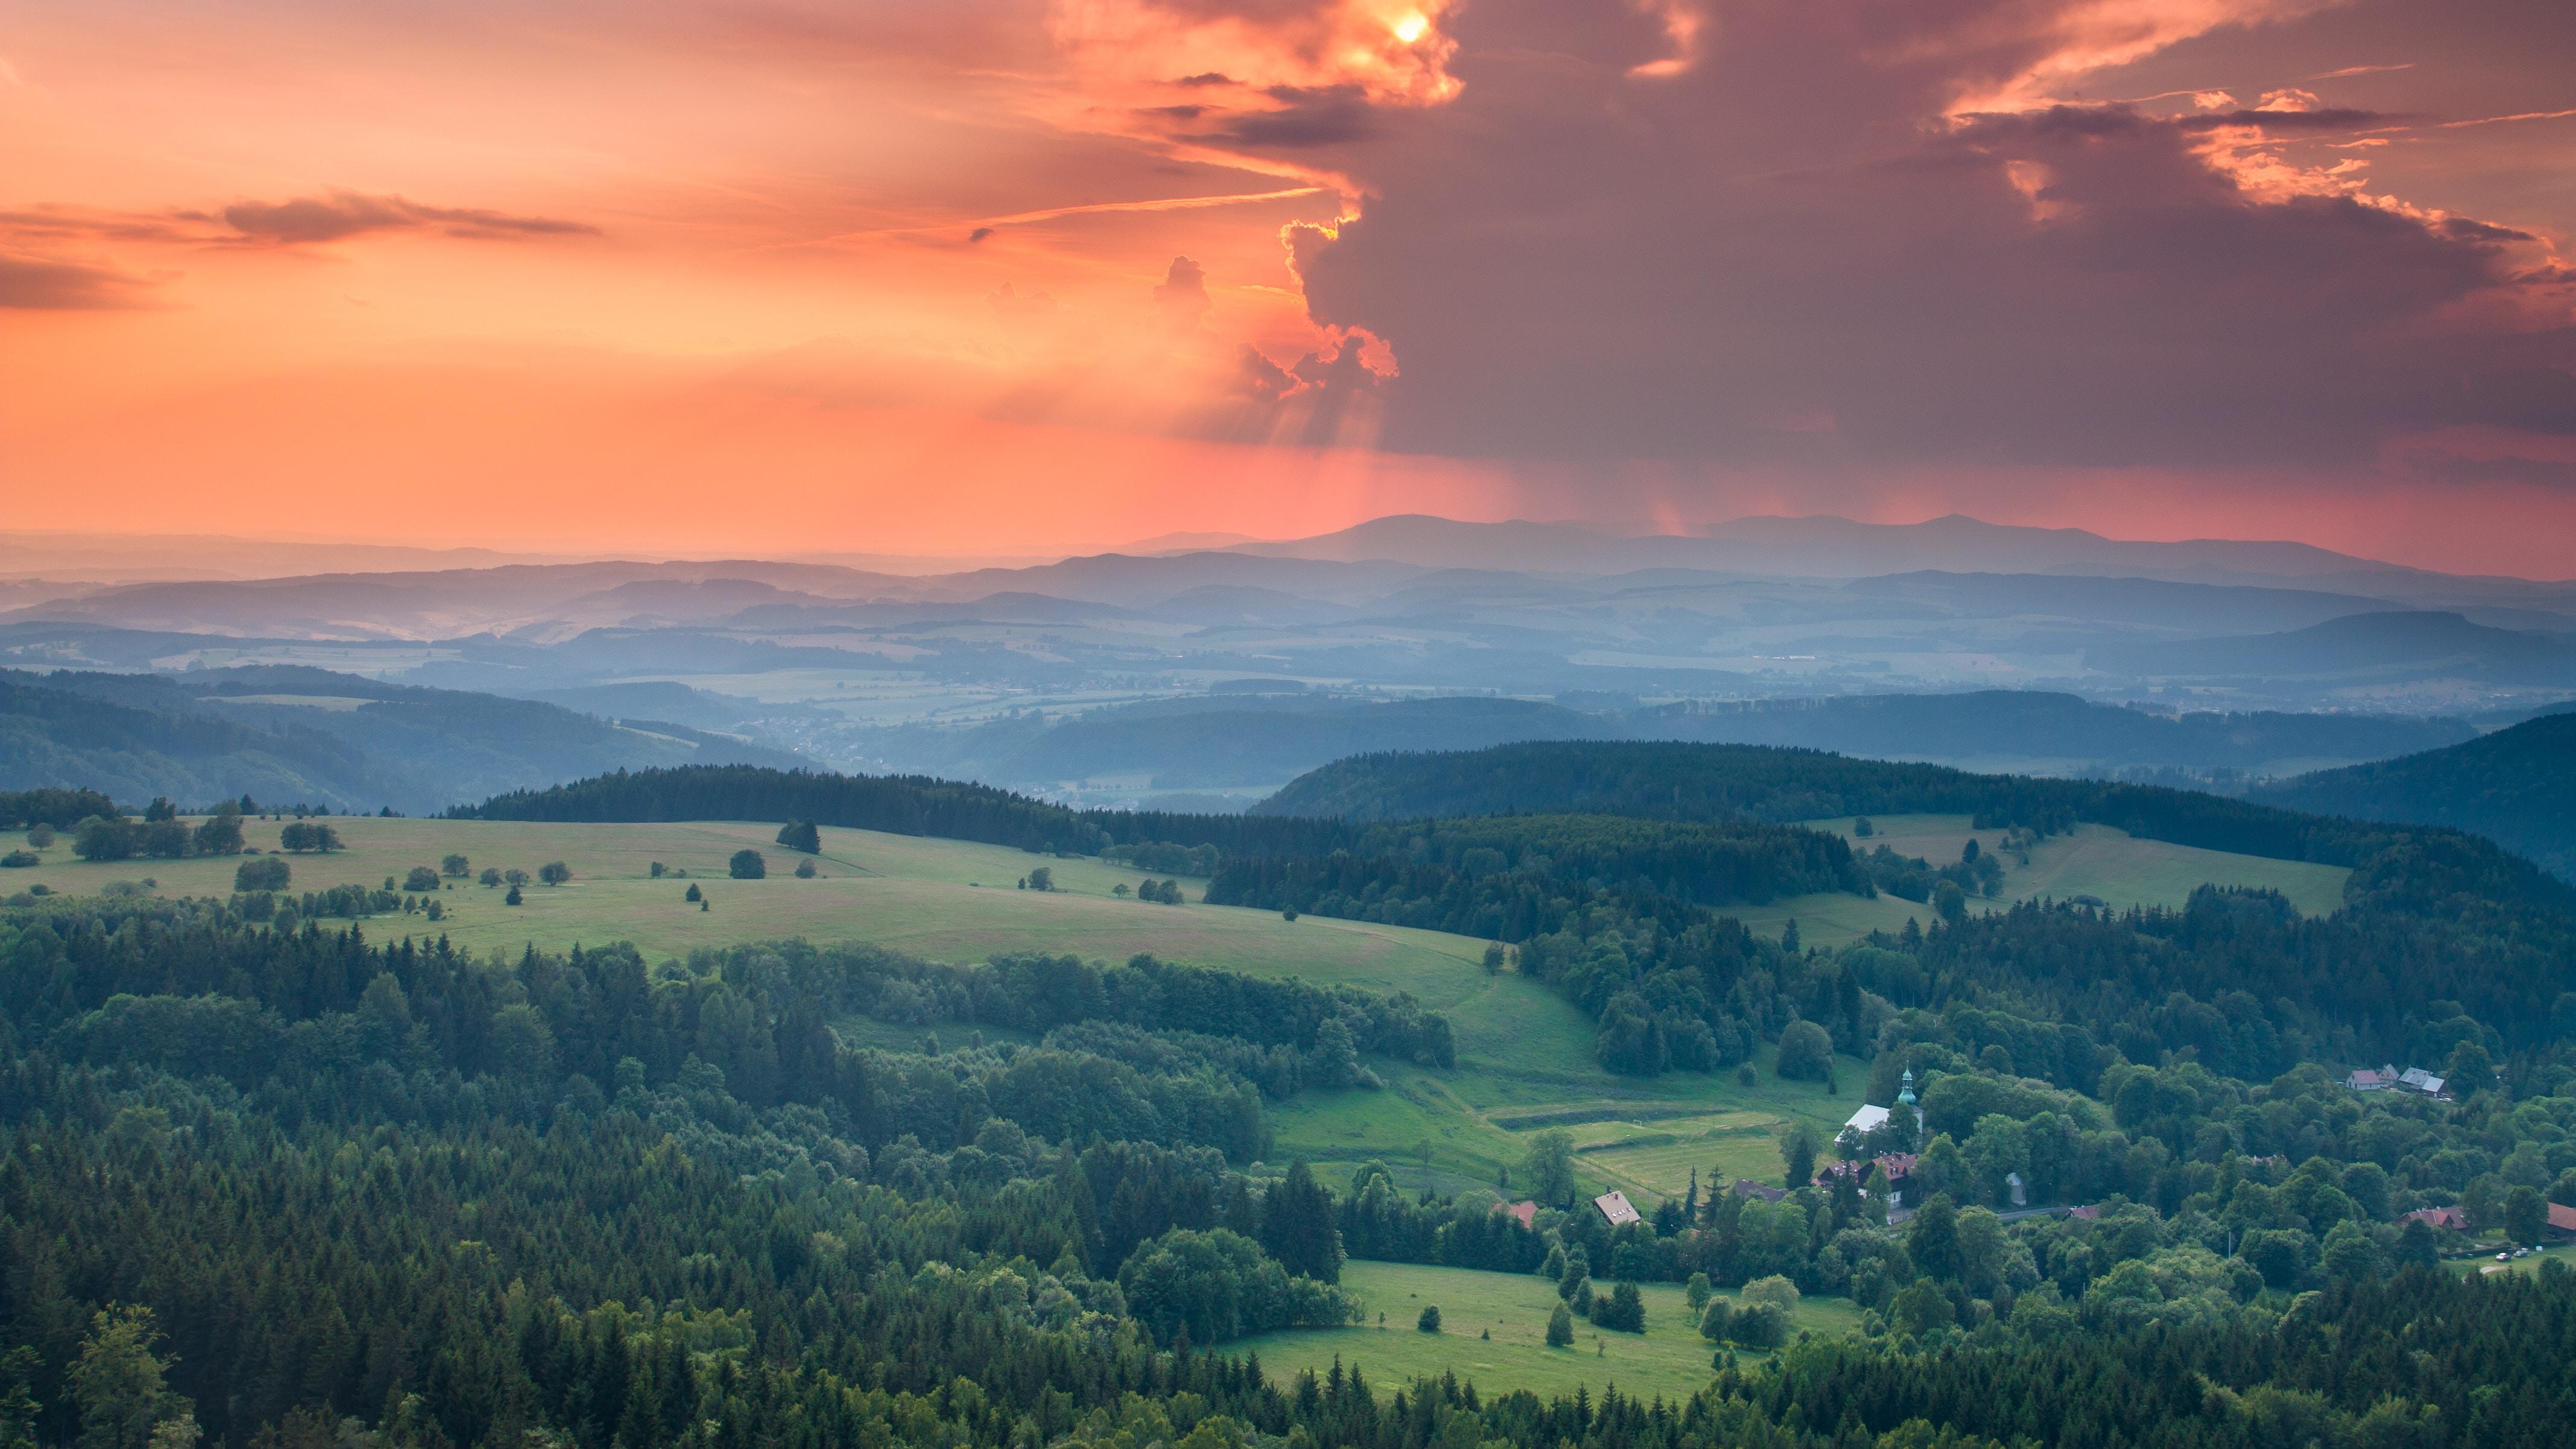 landscape photo of mountain